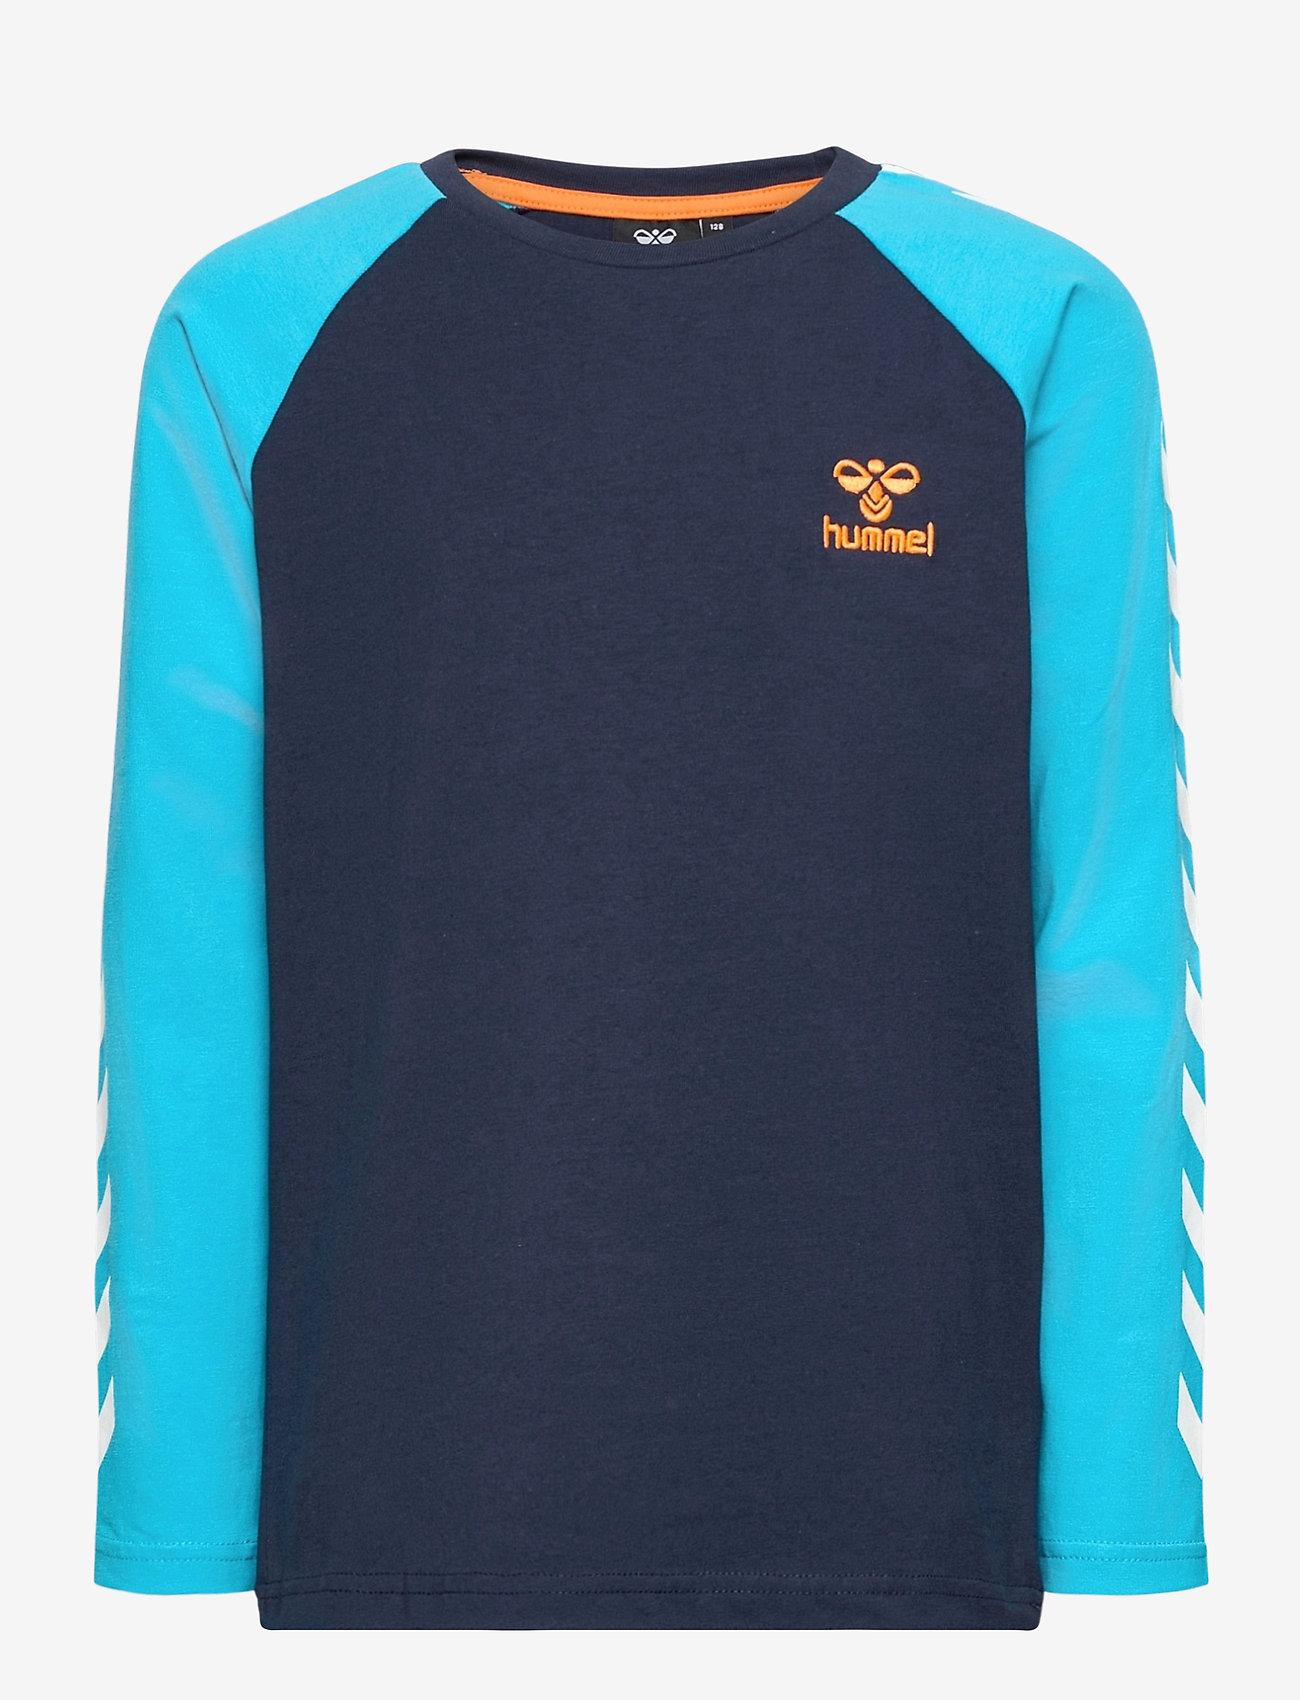 Hummel - hmlMICHAEL T-SHIRT L/S - long-sleeved t-shirts - scuba blue - 0